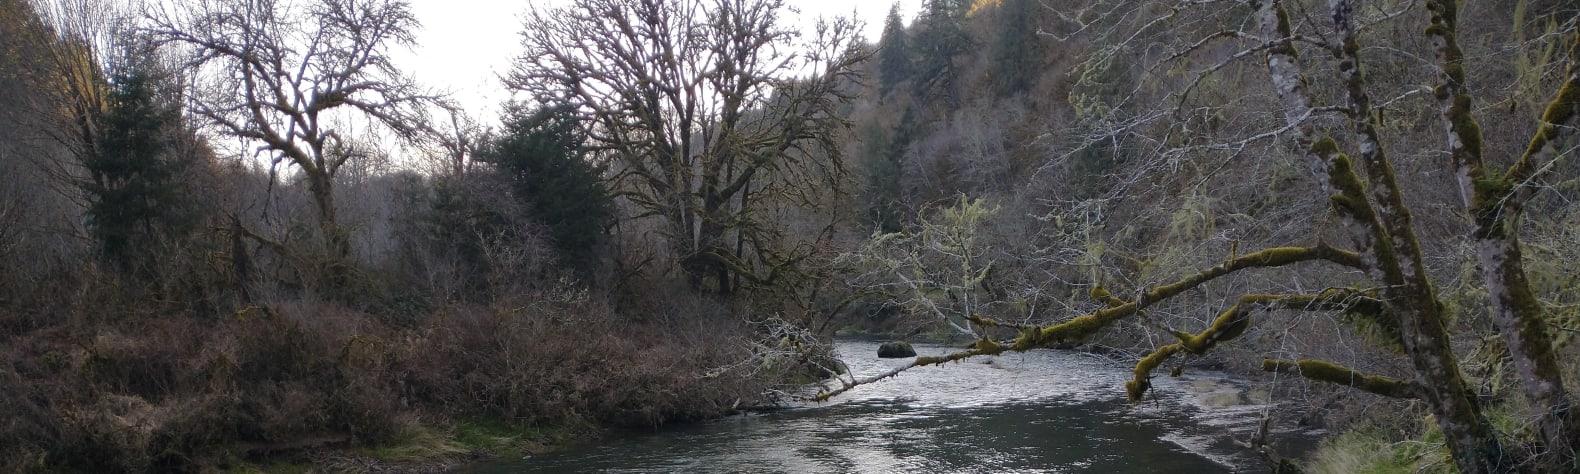 Alsea river seclusion